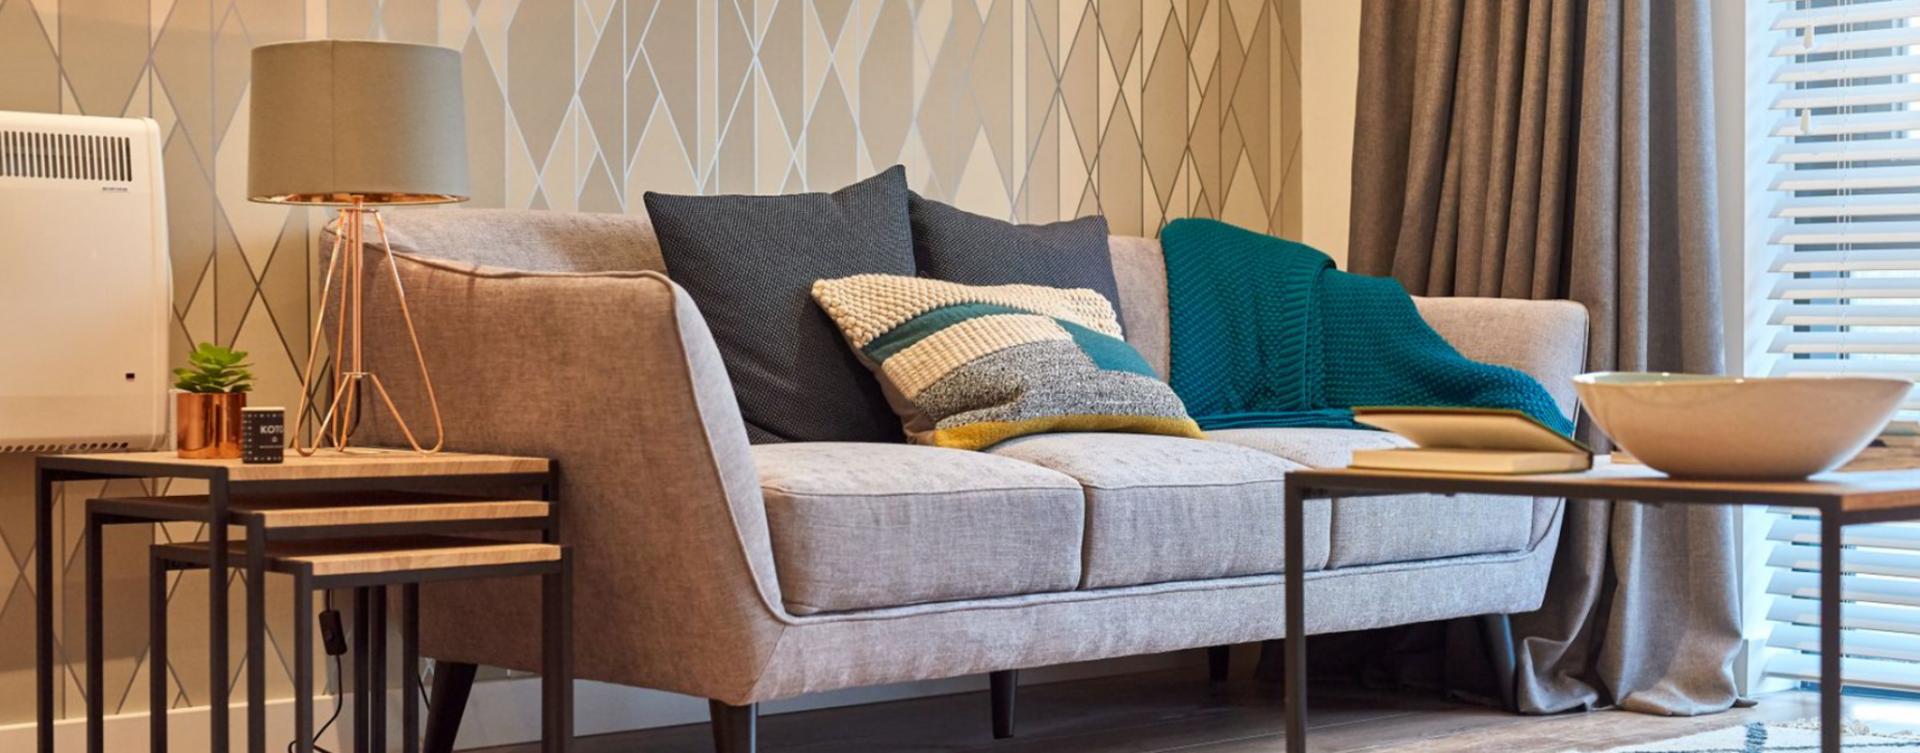 Sofa at Charles Hope Birmingham Central Apartments, Westside, Birmingham - Citybase Apartments